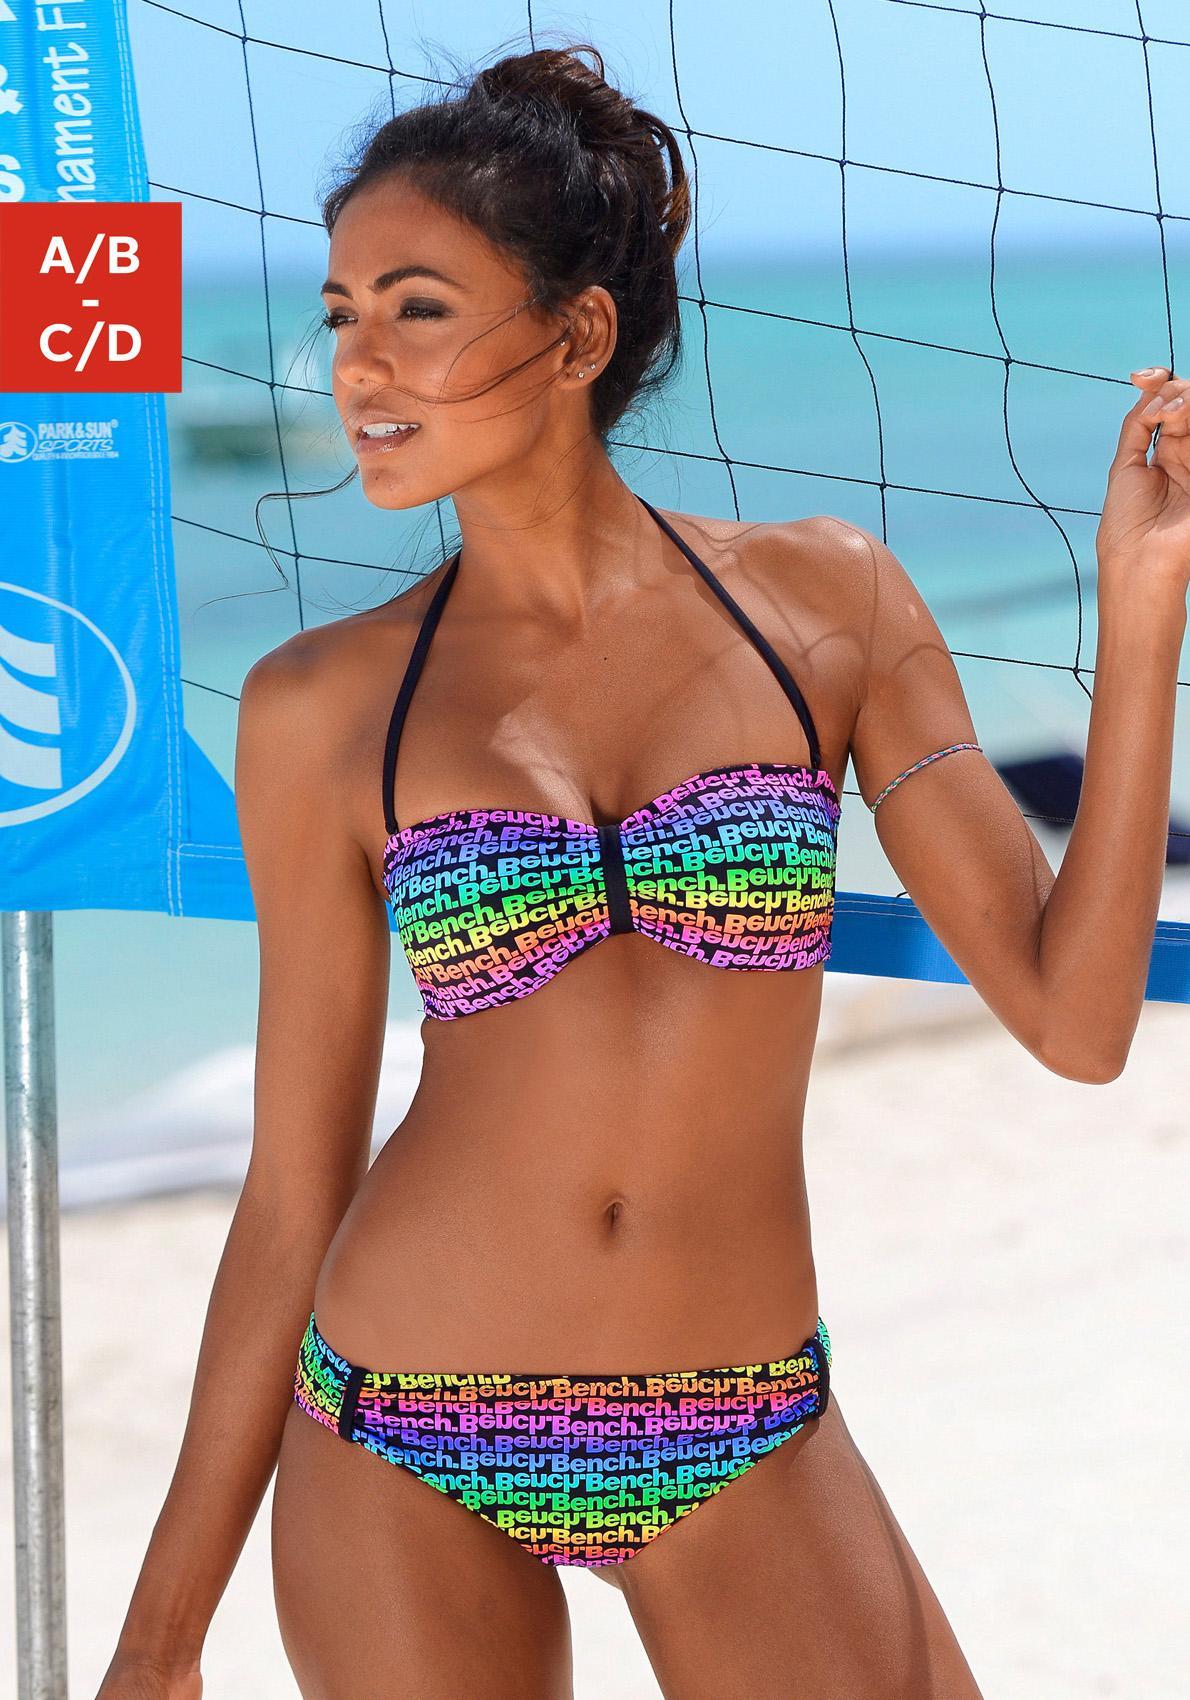 Bench. Bandeau-Bikini im bunten Druckdesign oder unifarben